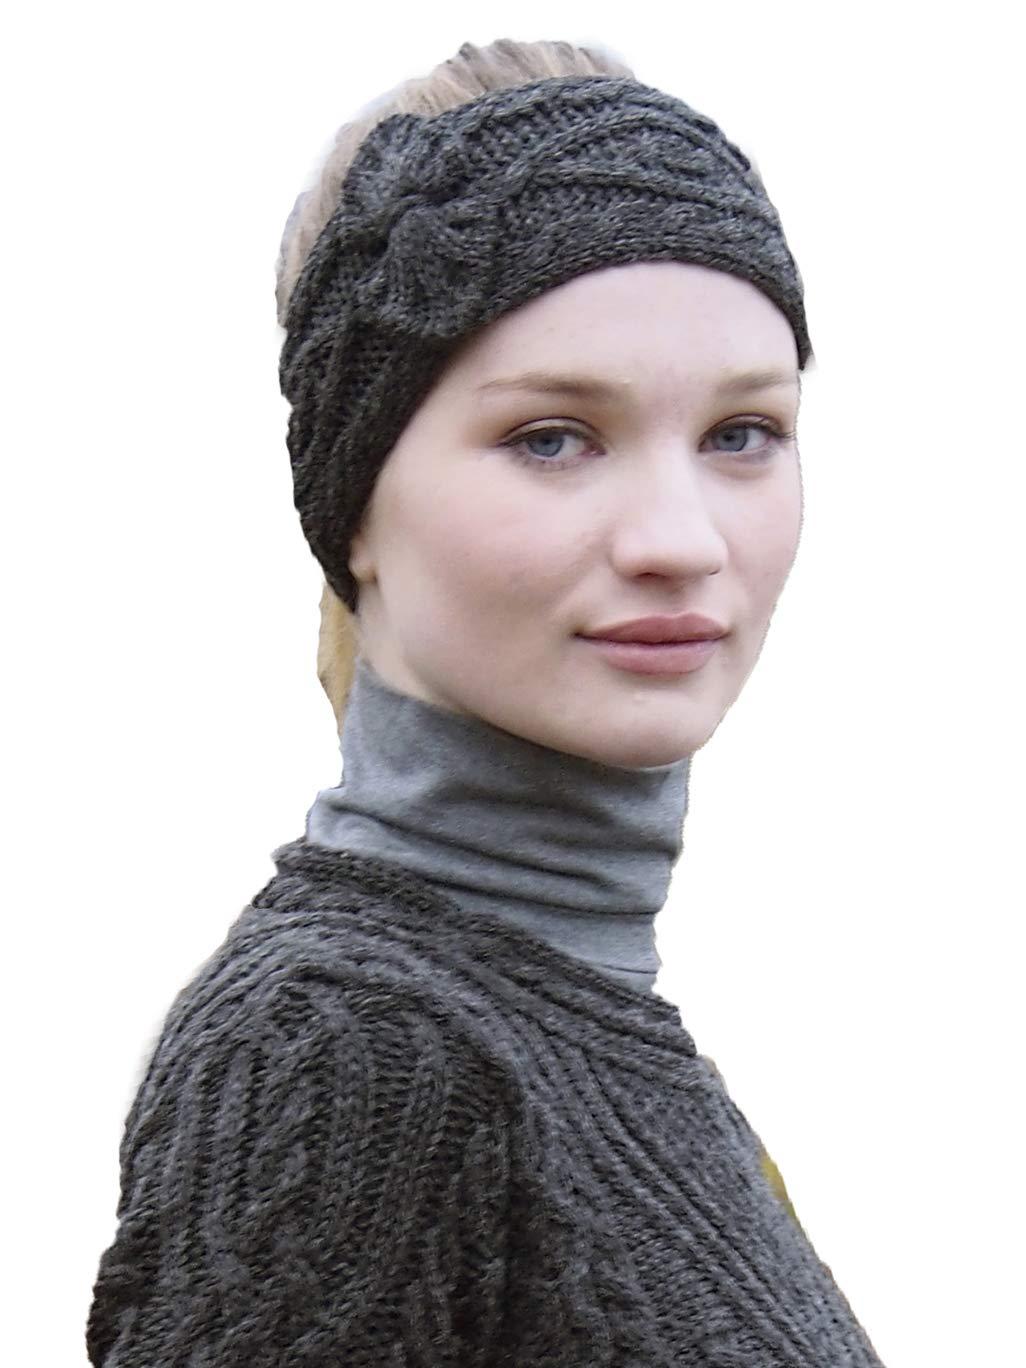 Aran Crafts Headband (100% Merino Wool) One Size Charcoal (X4341-CHAR)